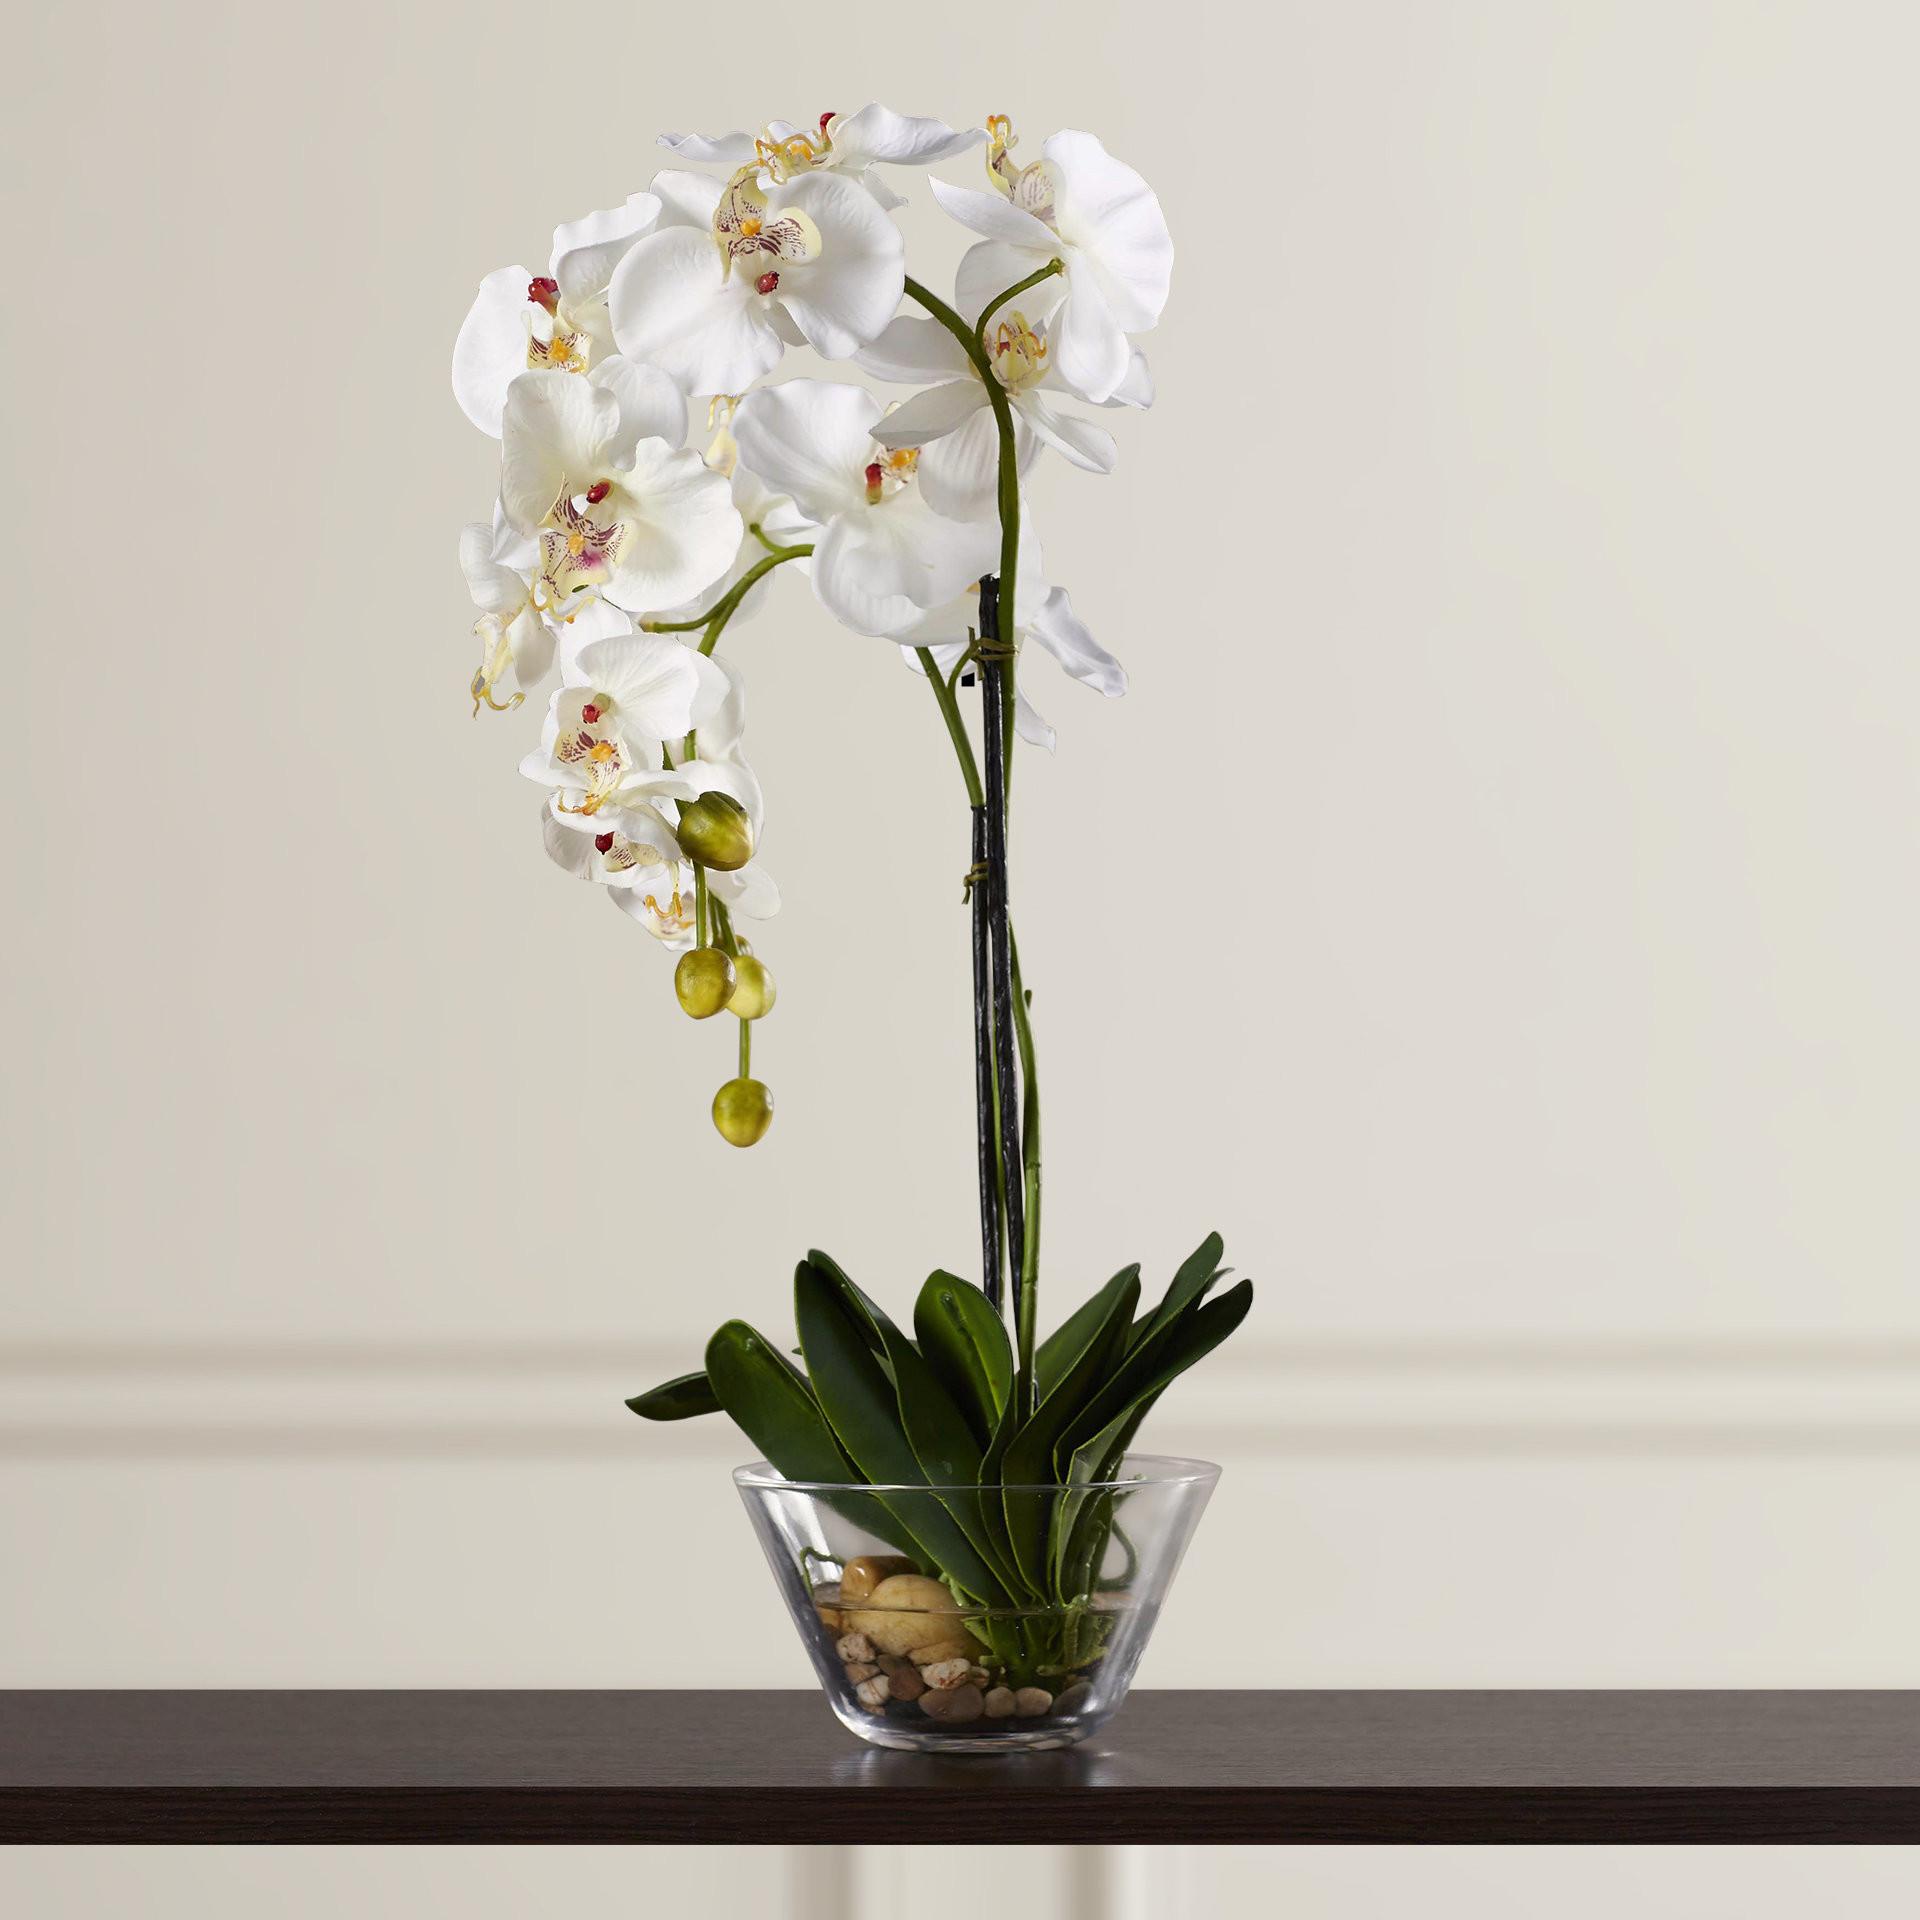 22 Elegant 4 Glass Cube Vase 2021 free download 4 glass cube vase of three posts phalaenopsis silk white orchid in glass vase reviews for three posts phalaenopsis silk white orchid in glass vase reviews wayfair